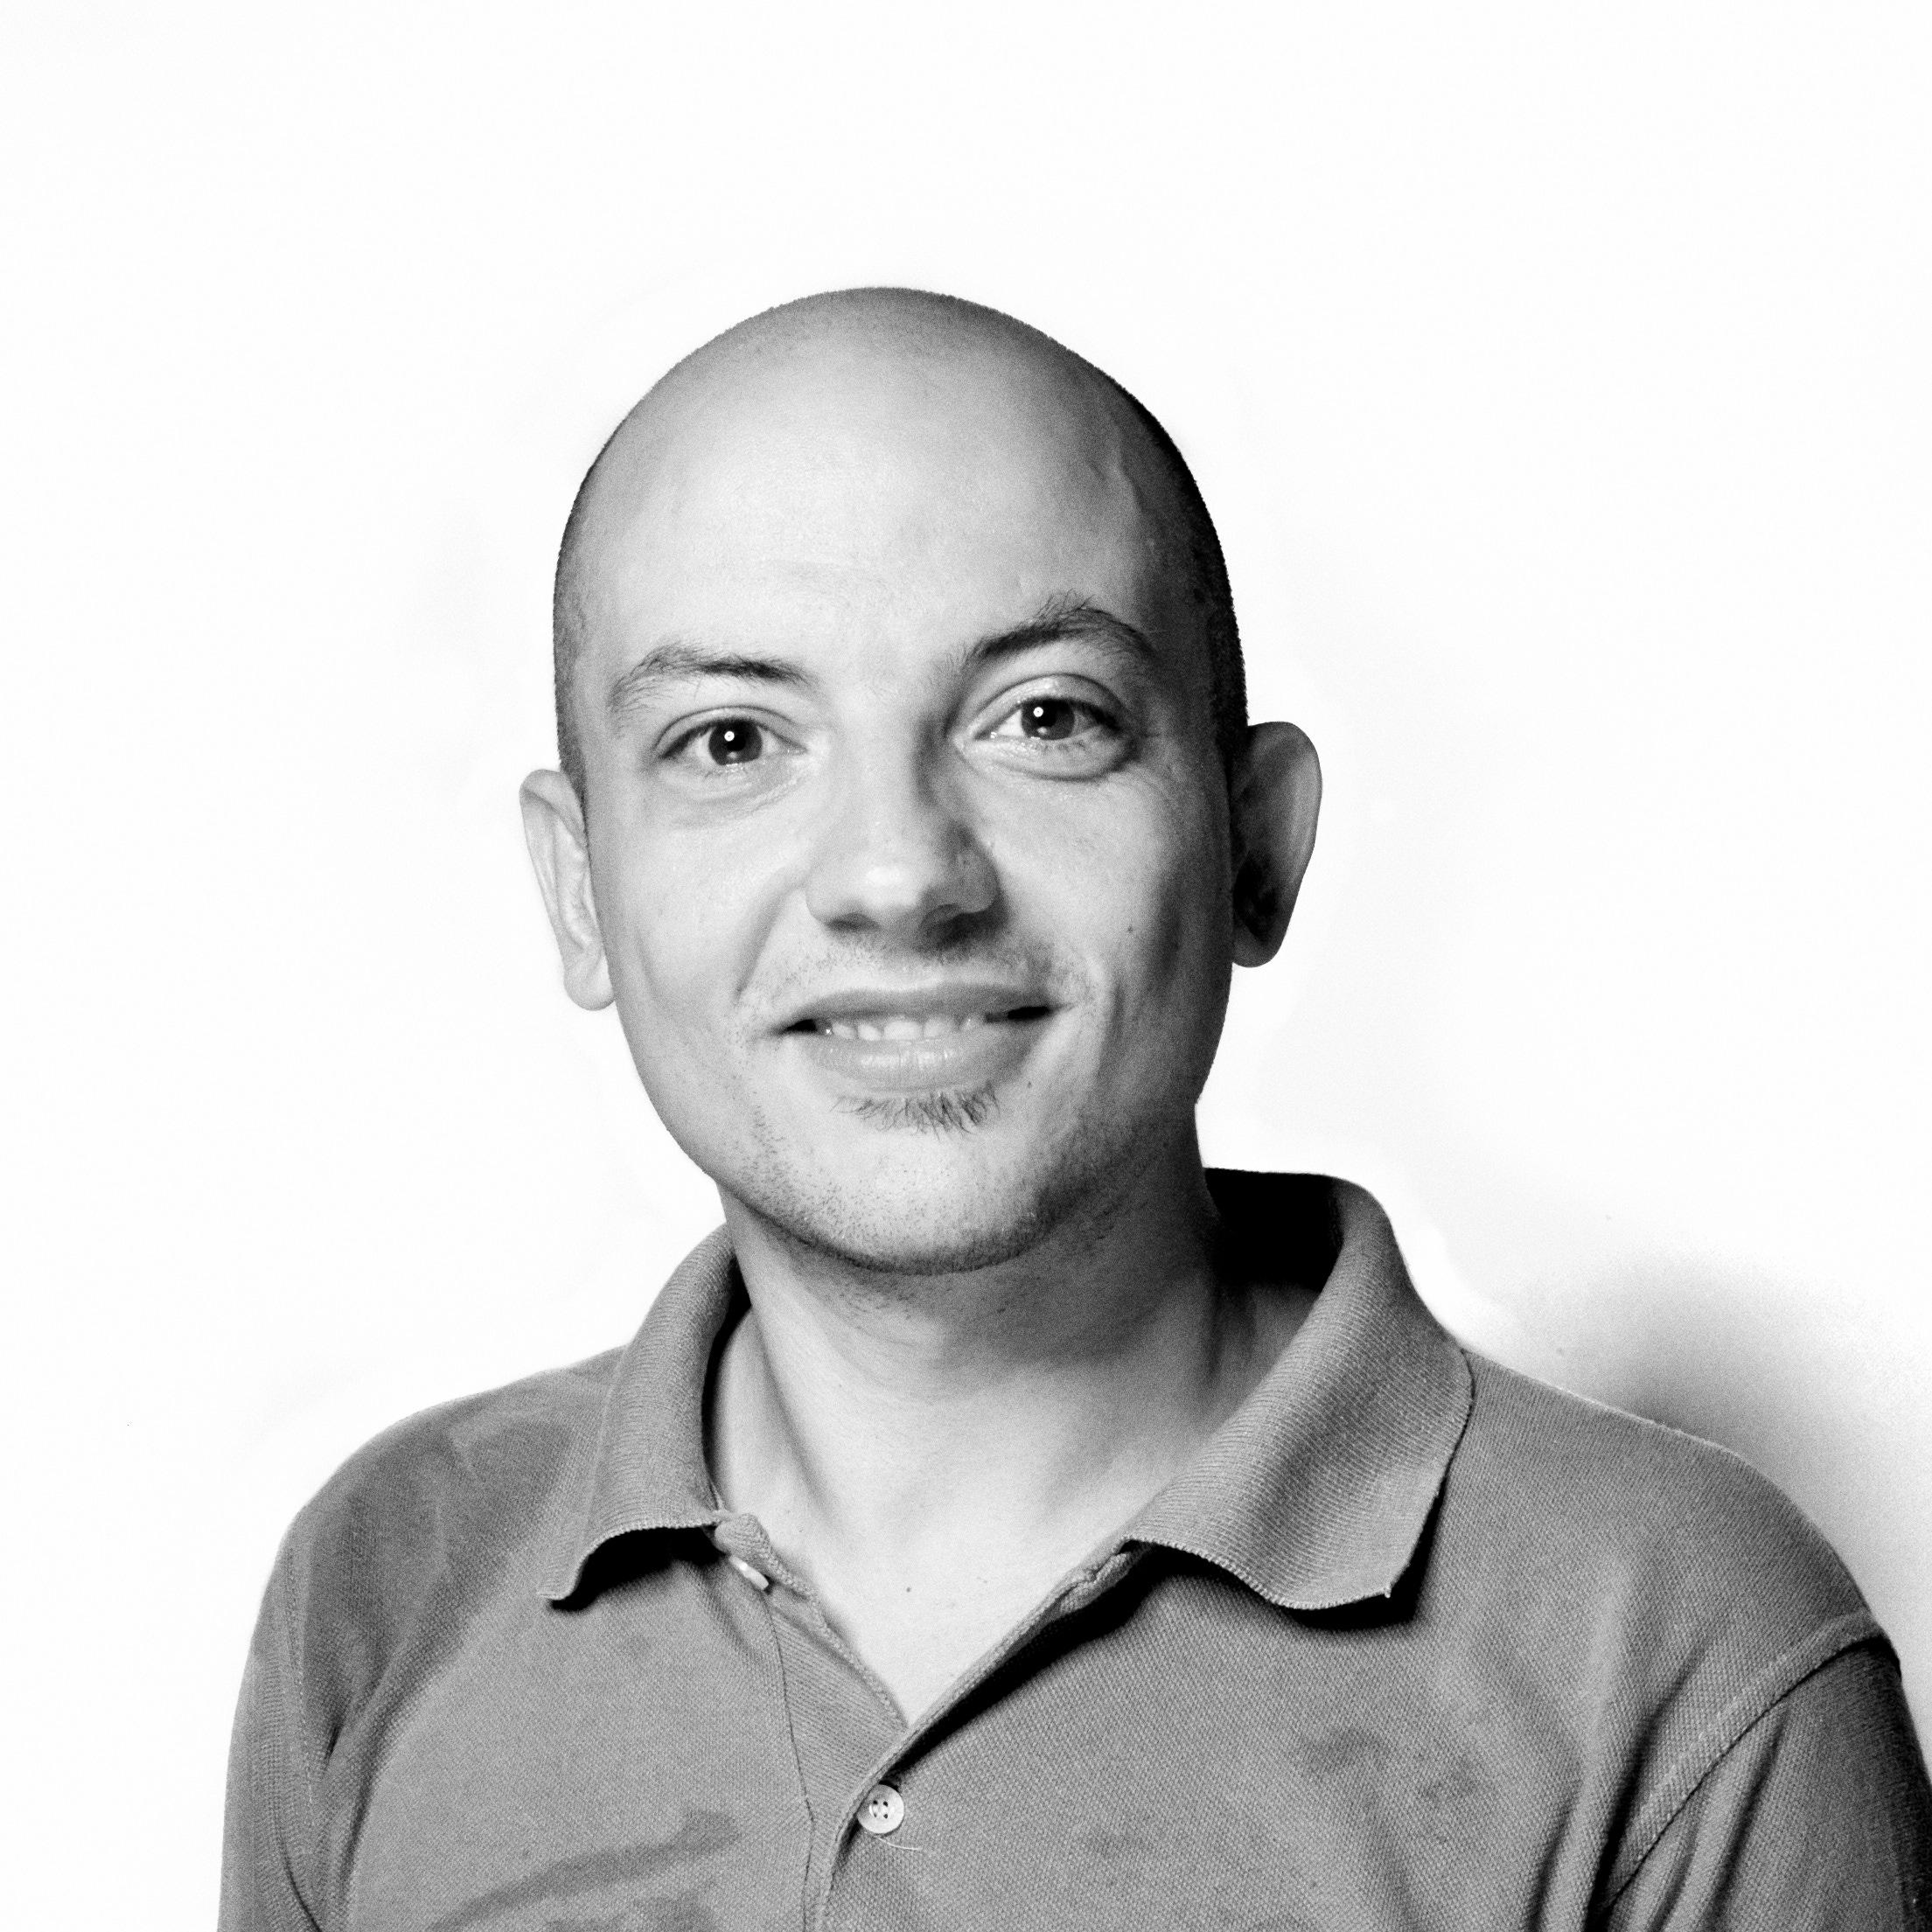 Paolo Errico